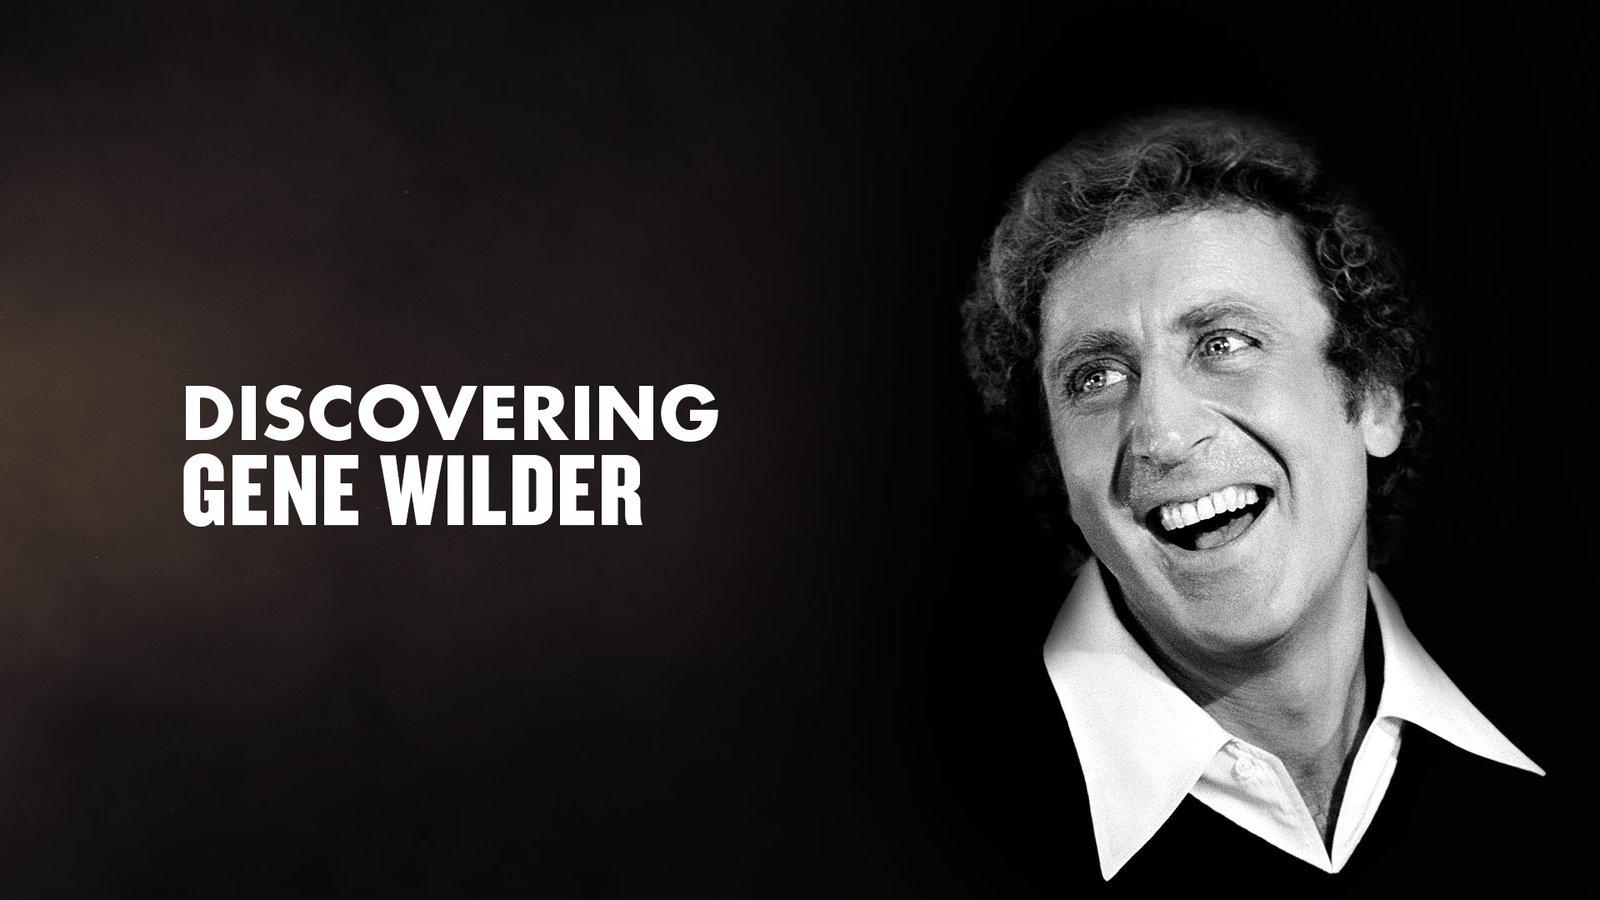 Discovering Gene Wilder